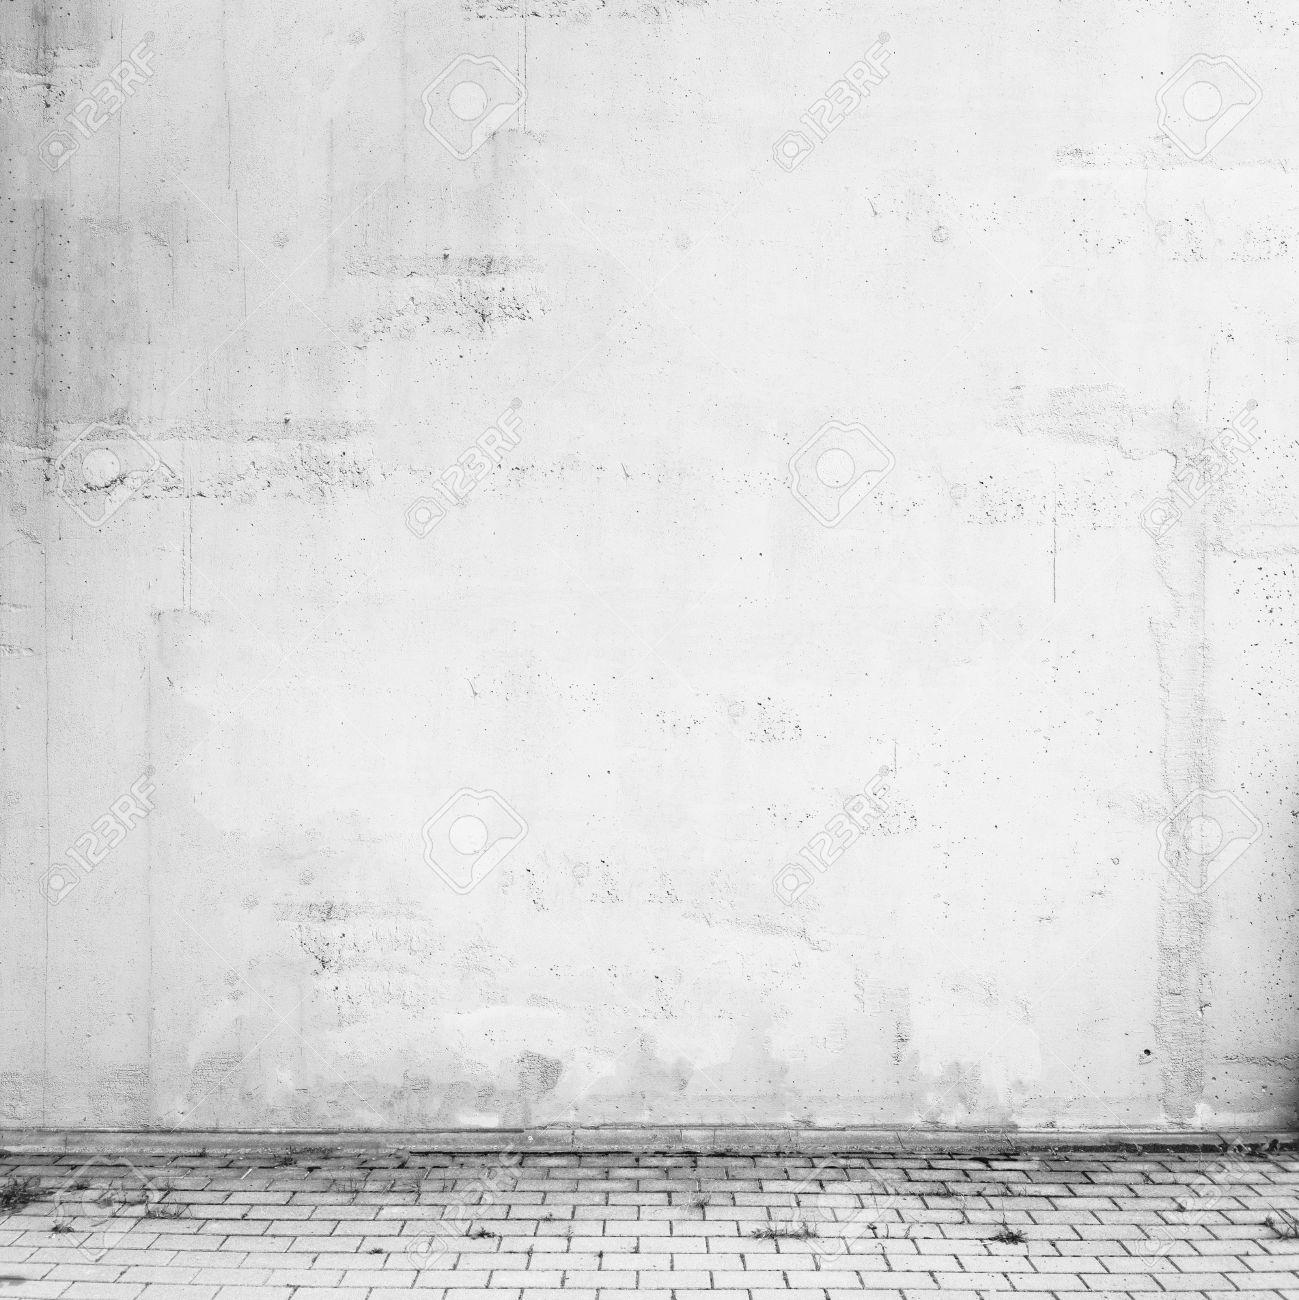 Empty Concrete Street Wall Texture